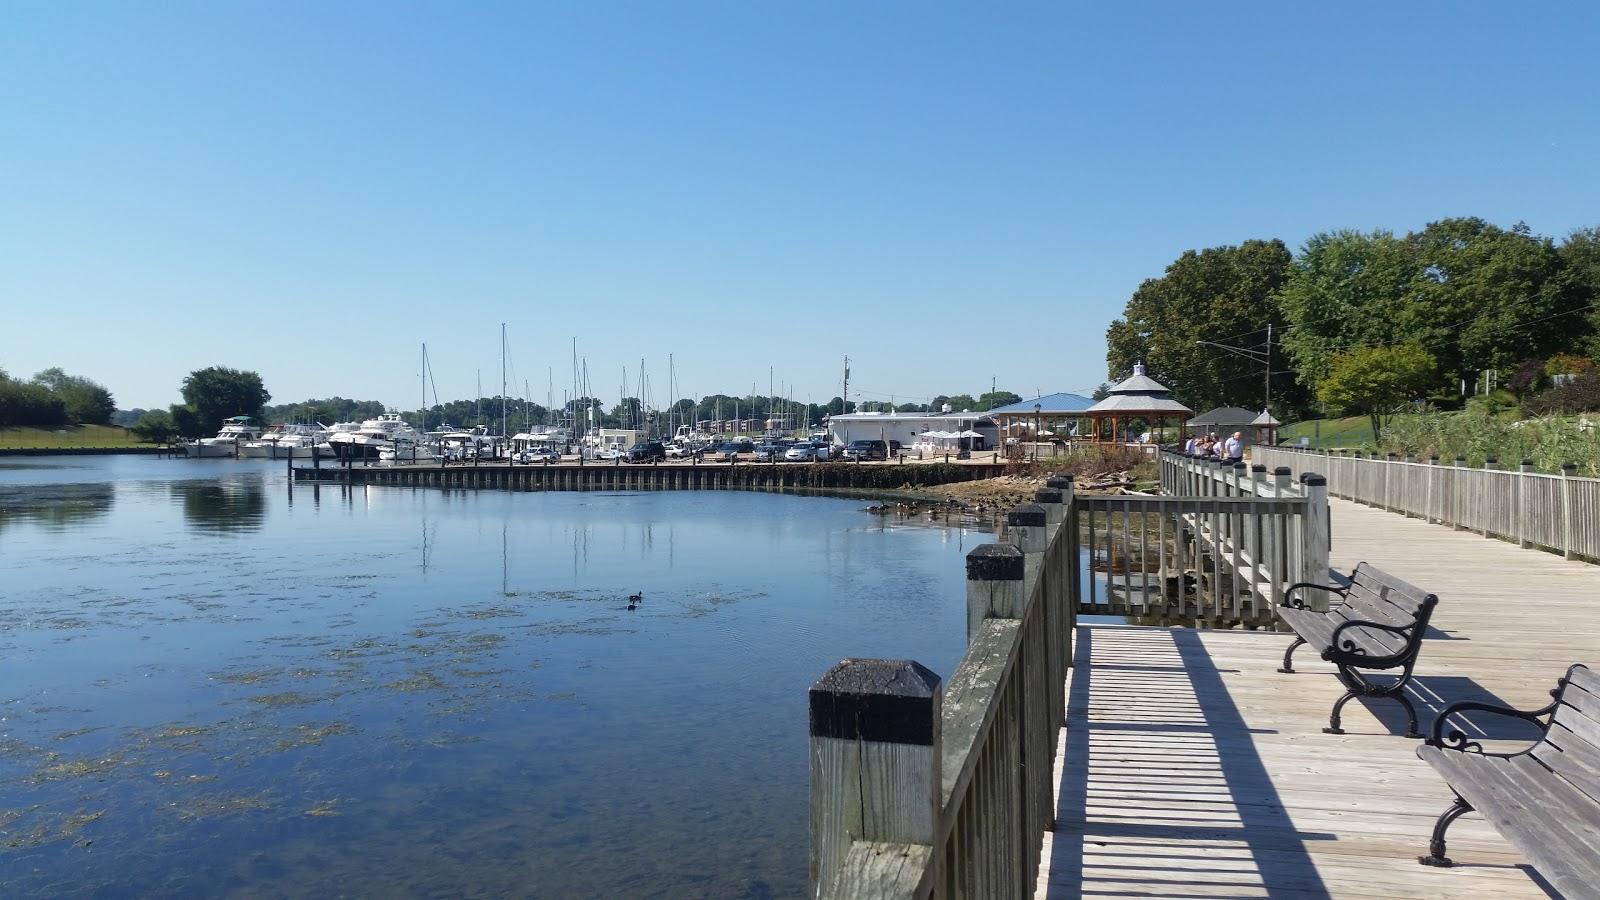 Susquehanna River Running Festival Event Image